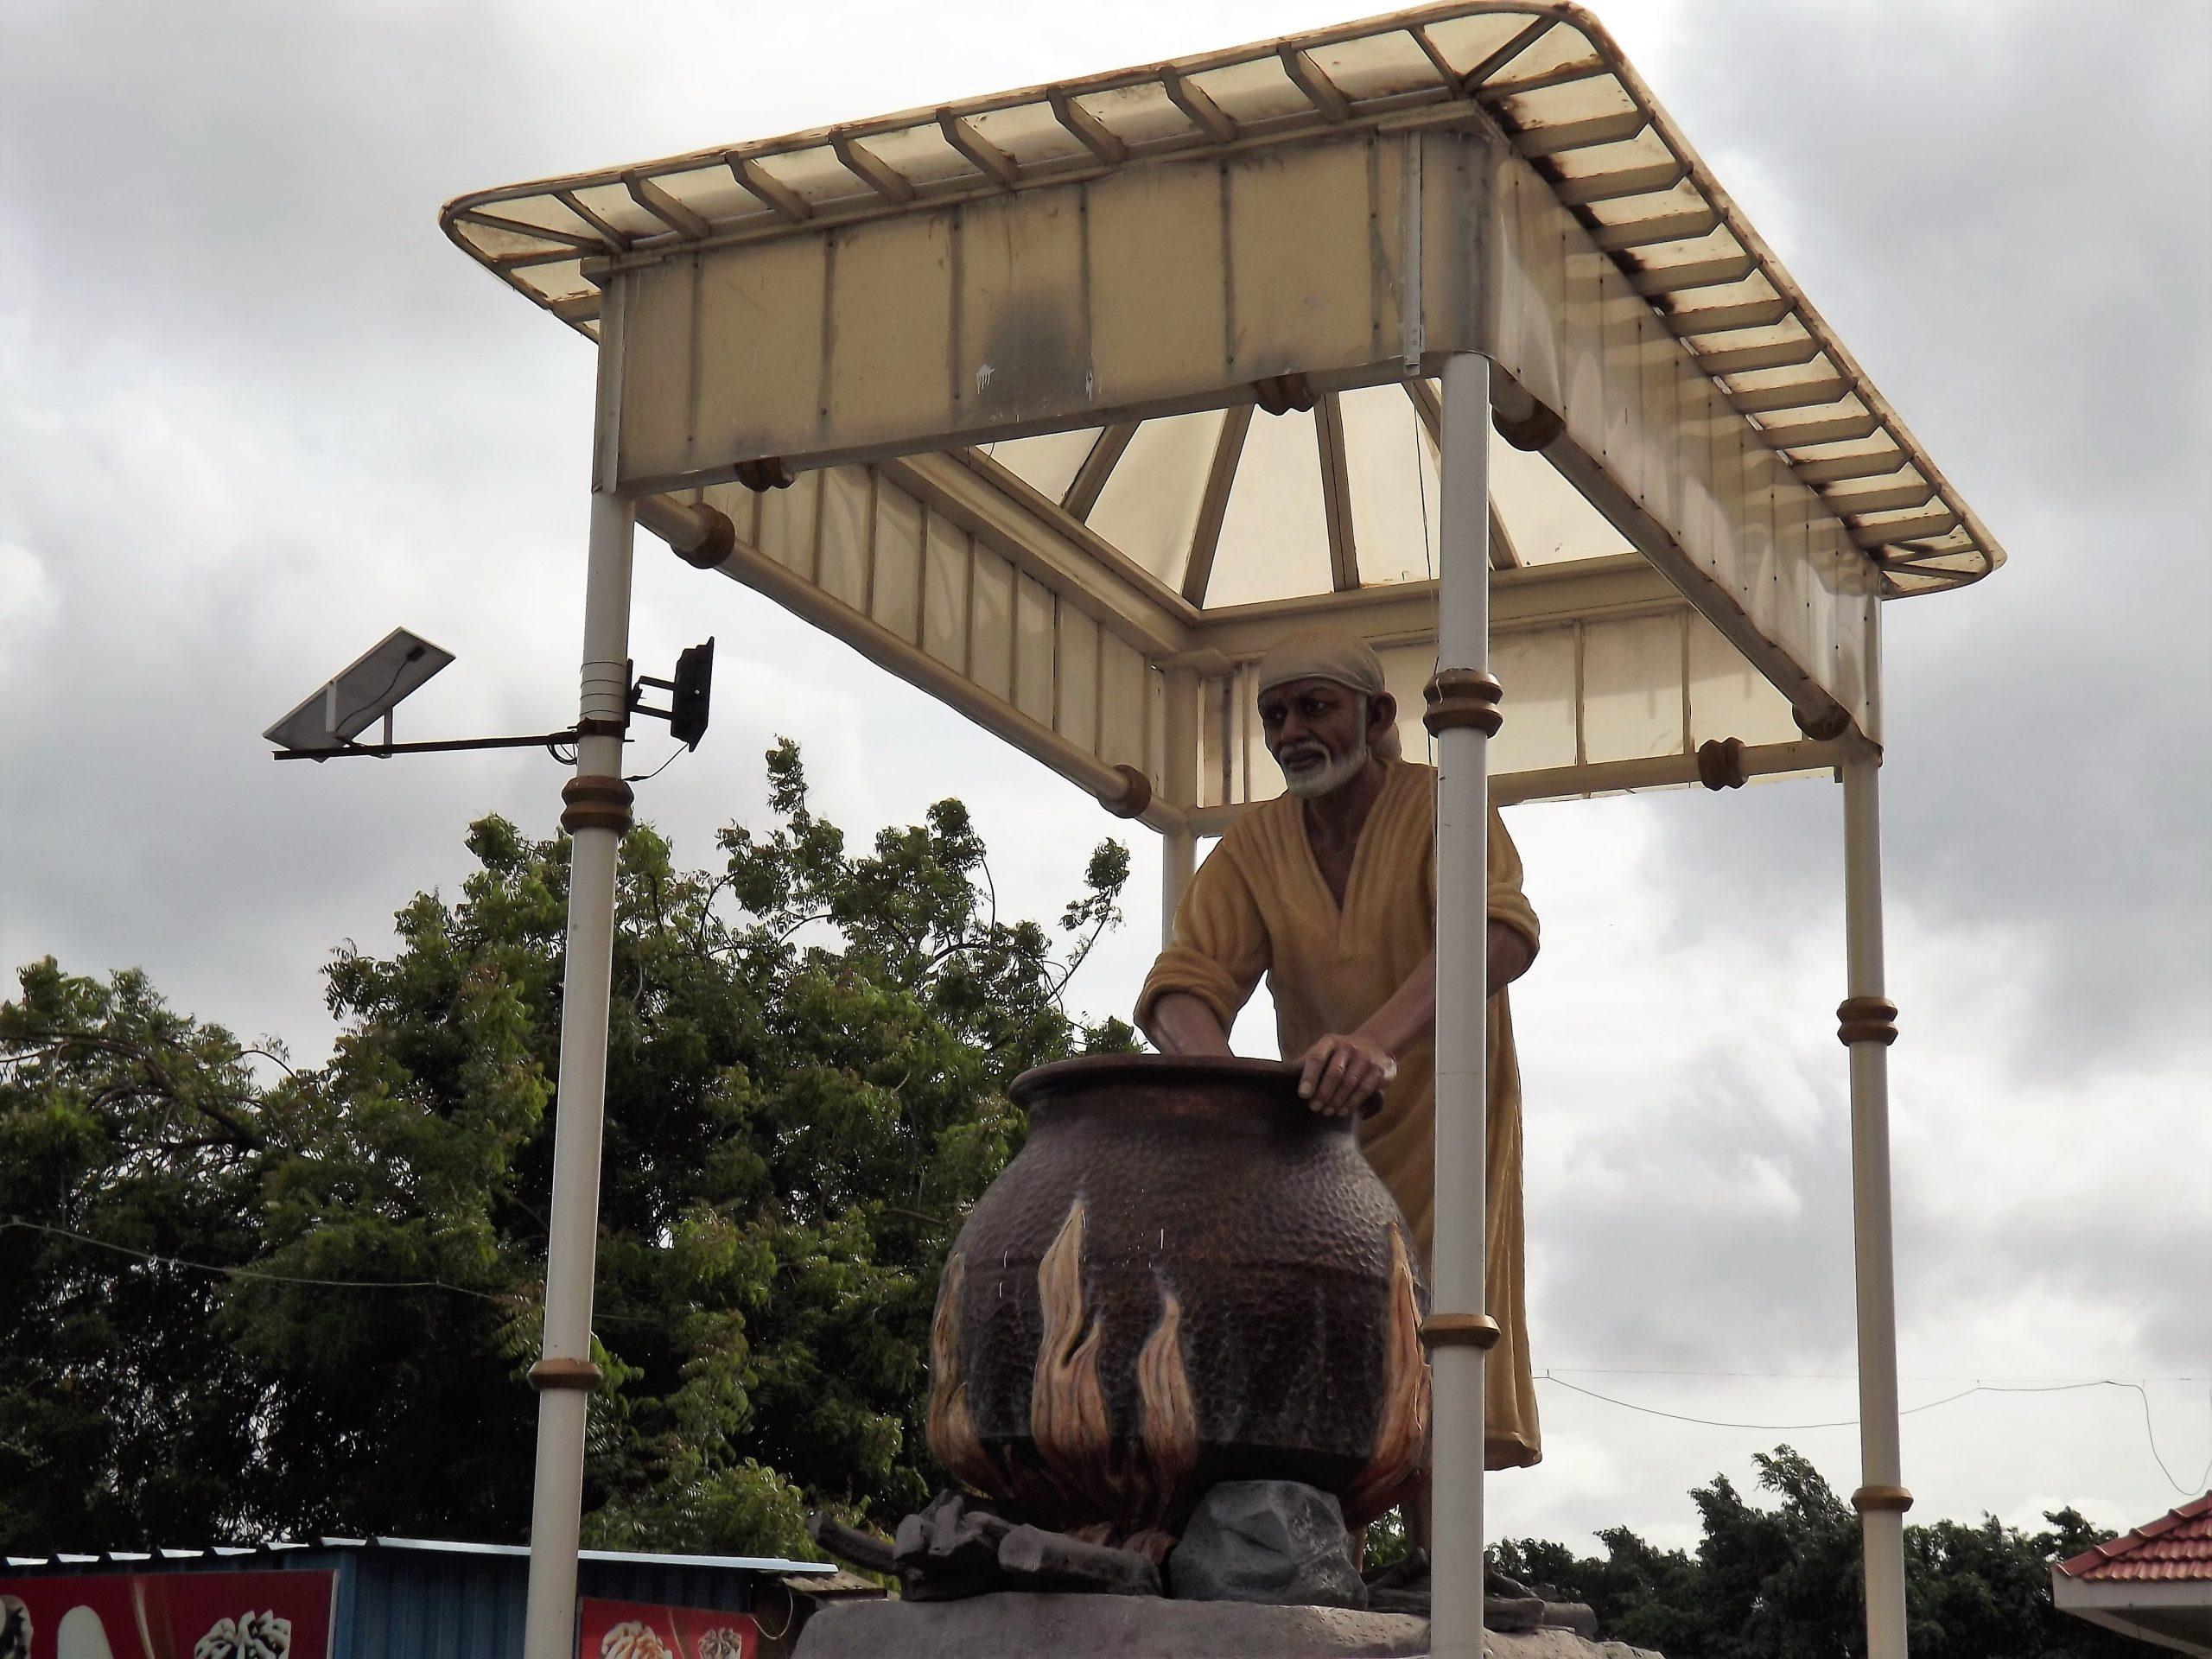 A statue of Sai Baba